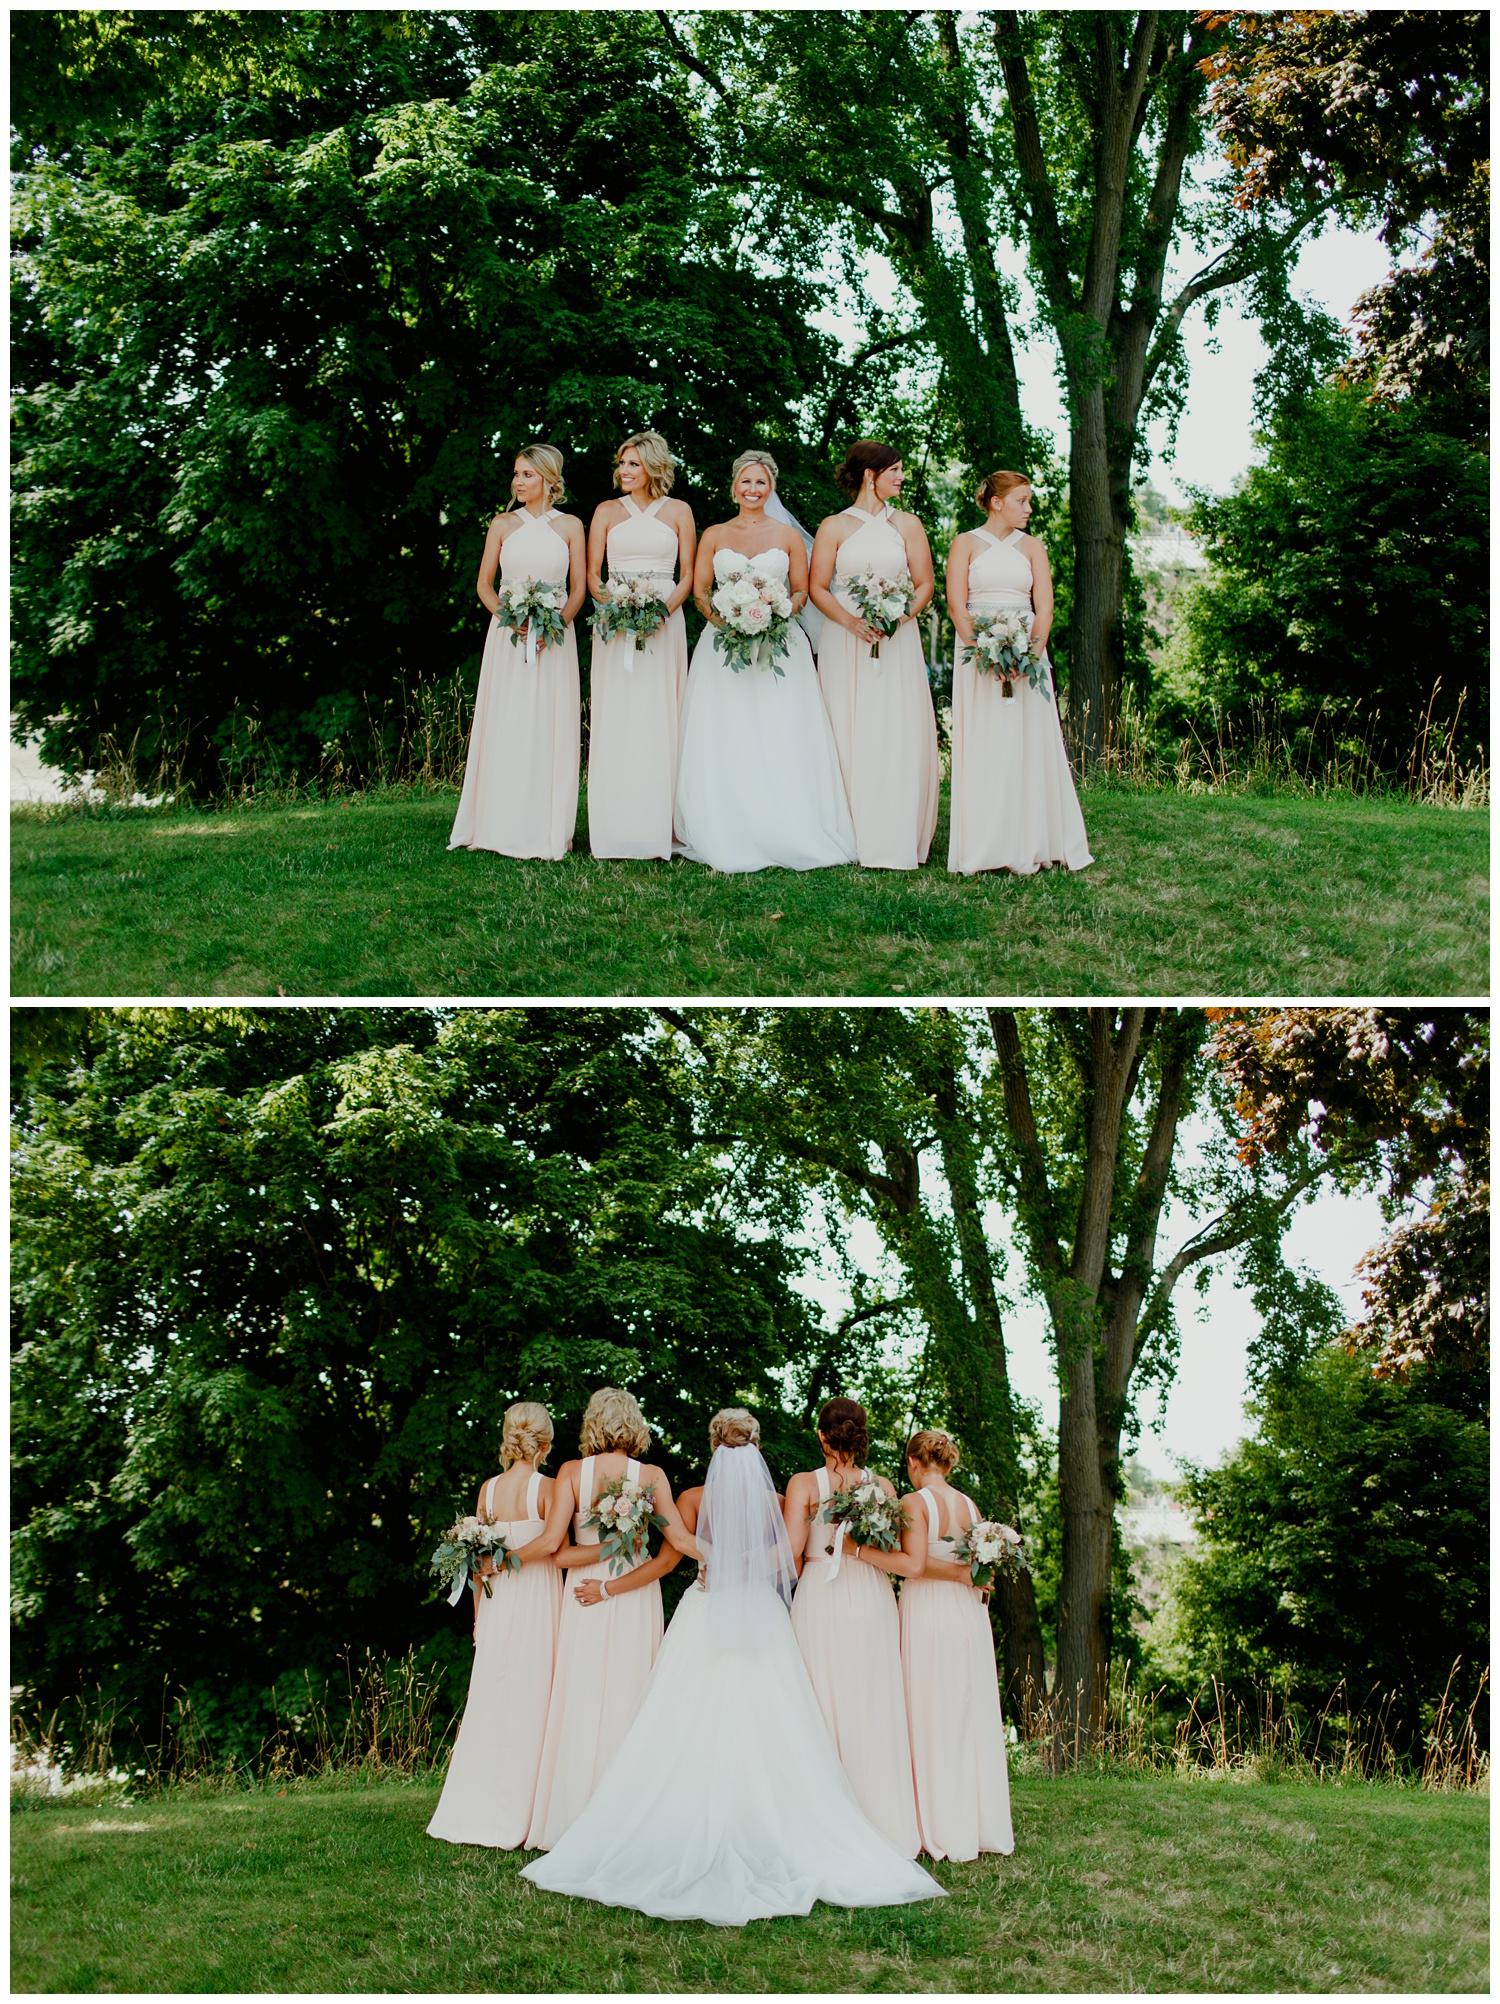 verandawitcombweddingphotographyrooftopceremonysilverbeachfinearttphotographyjournalisticstyle22.jpg